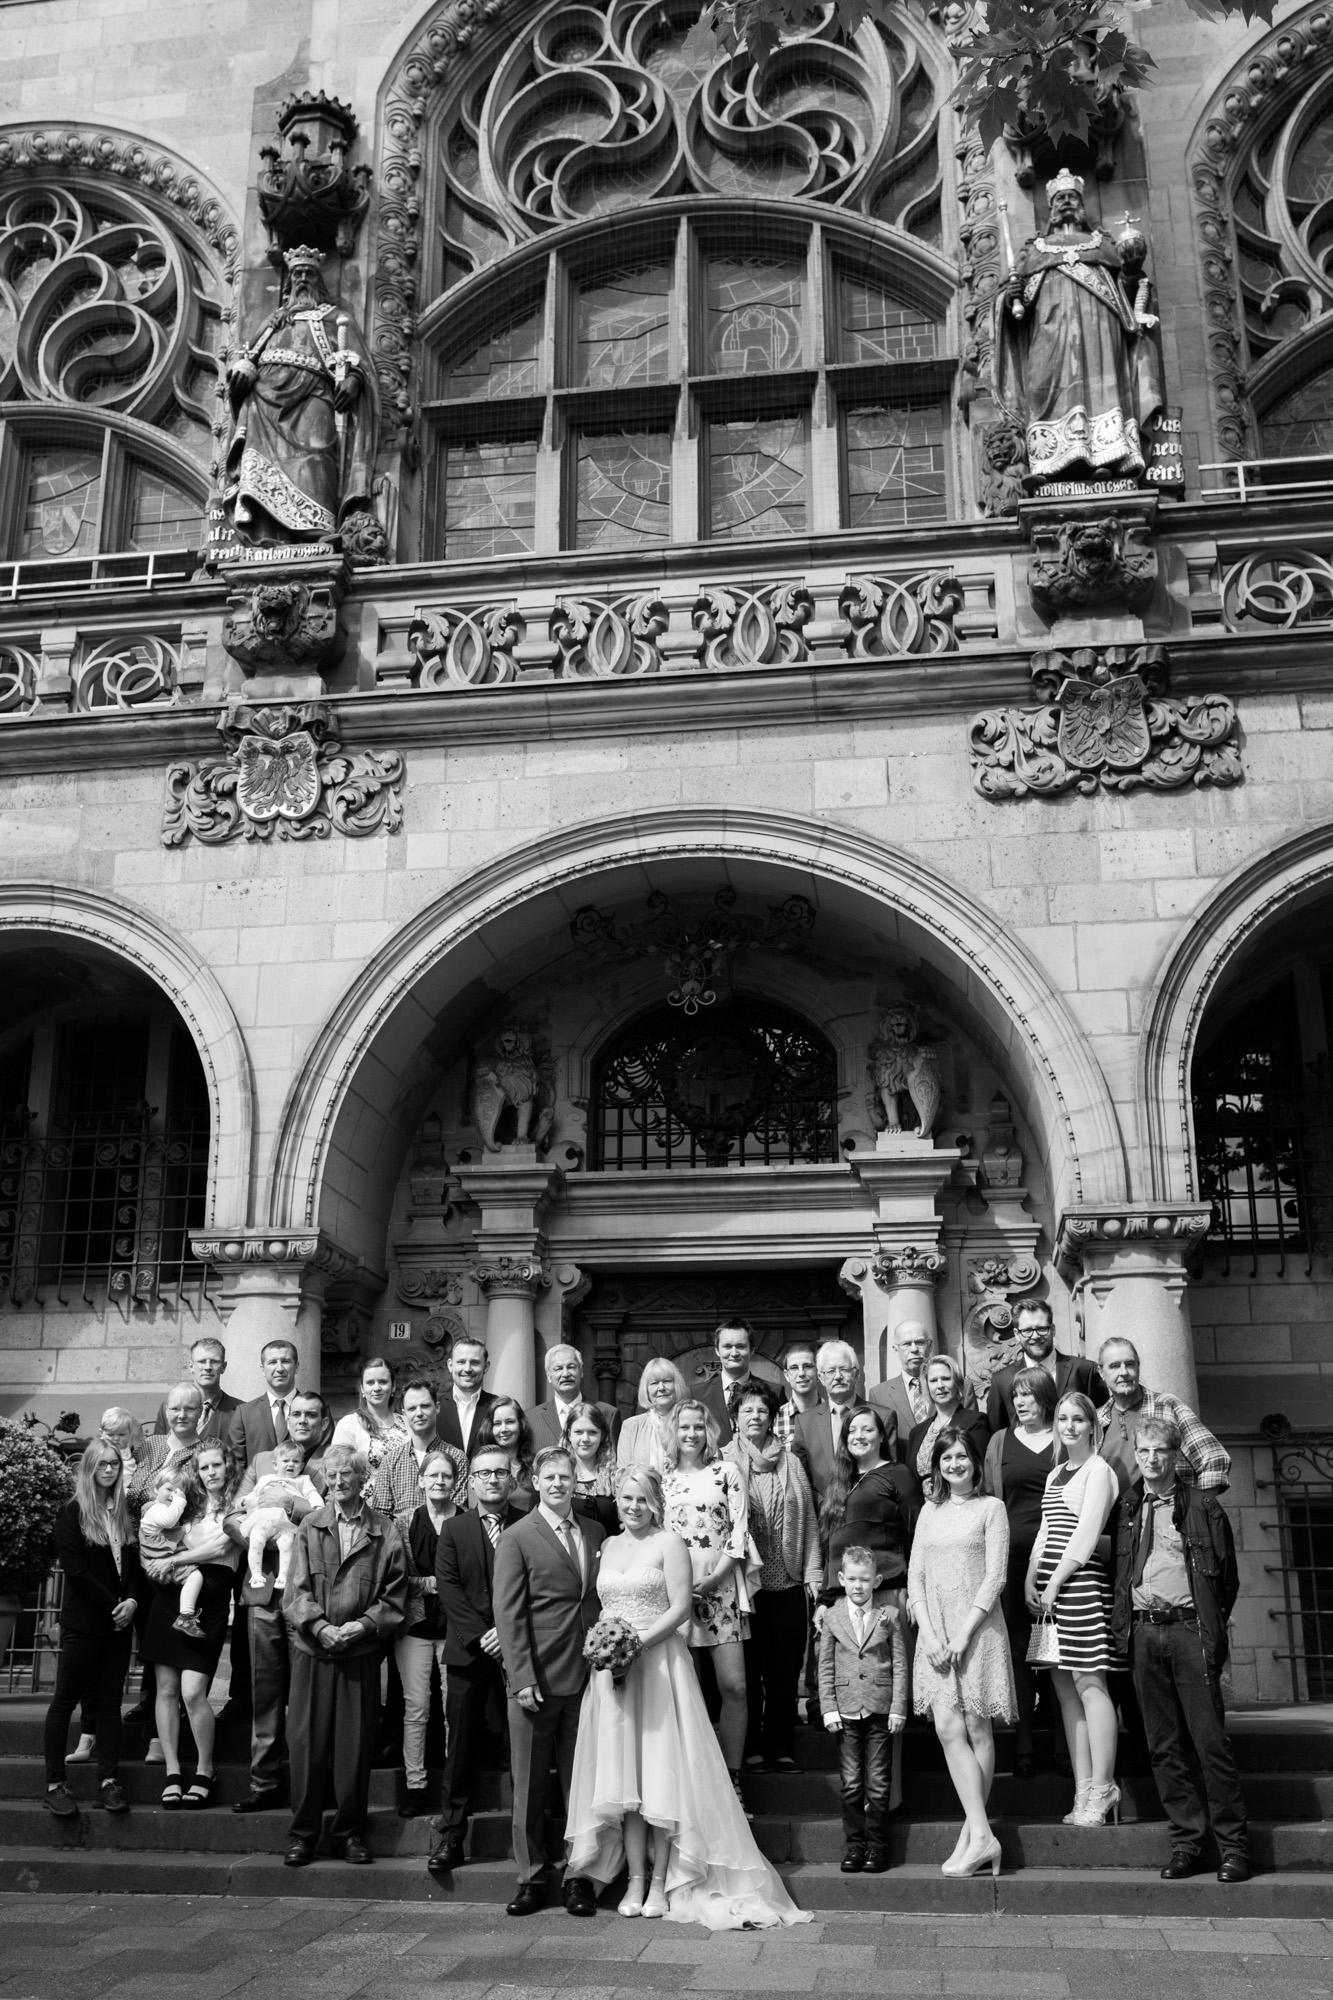 Claudia-Krawinkel-Hochzeitsfotografie-Essen-Duisburg-Standesamt-Schloss-Borbeck-18